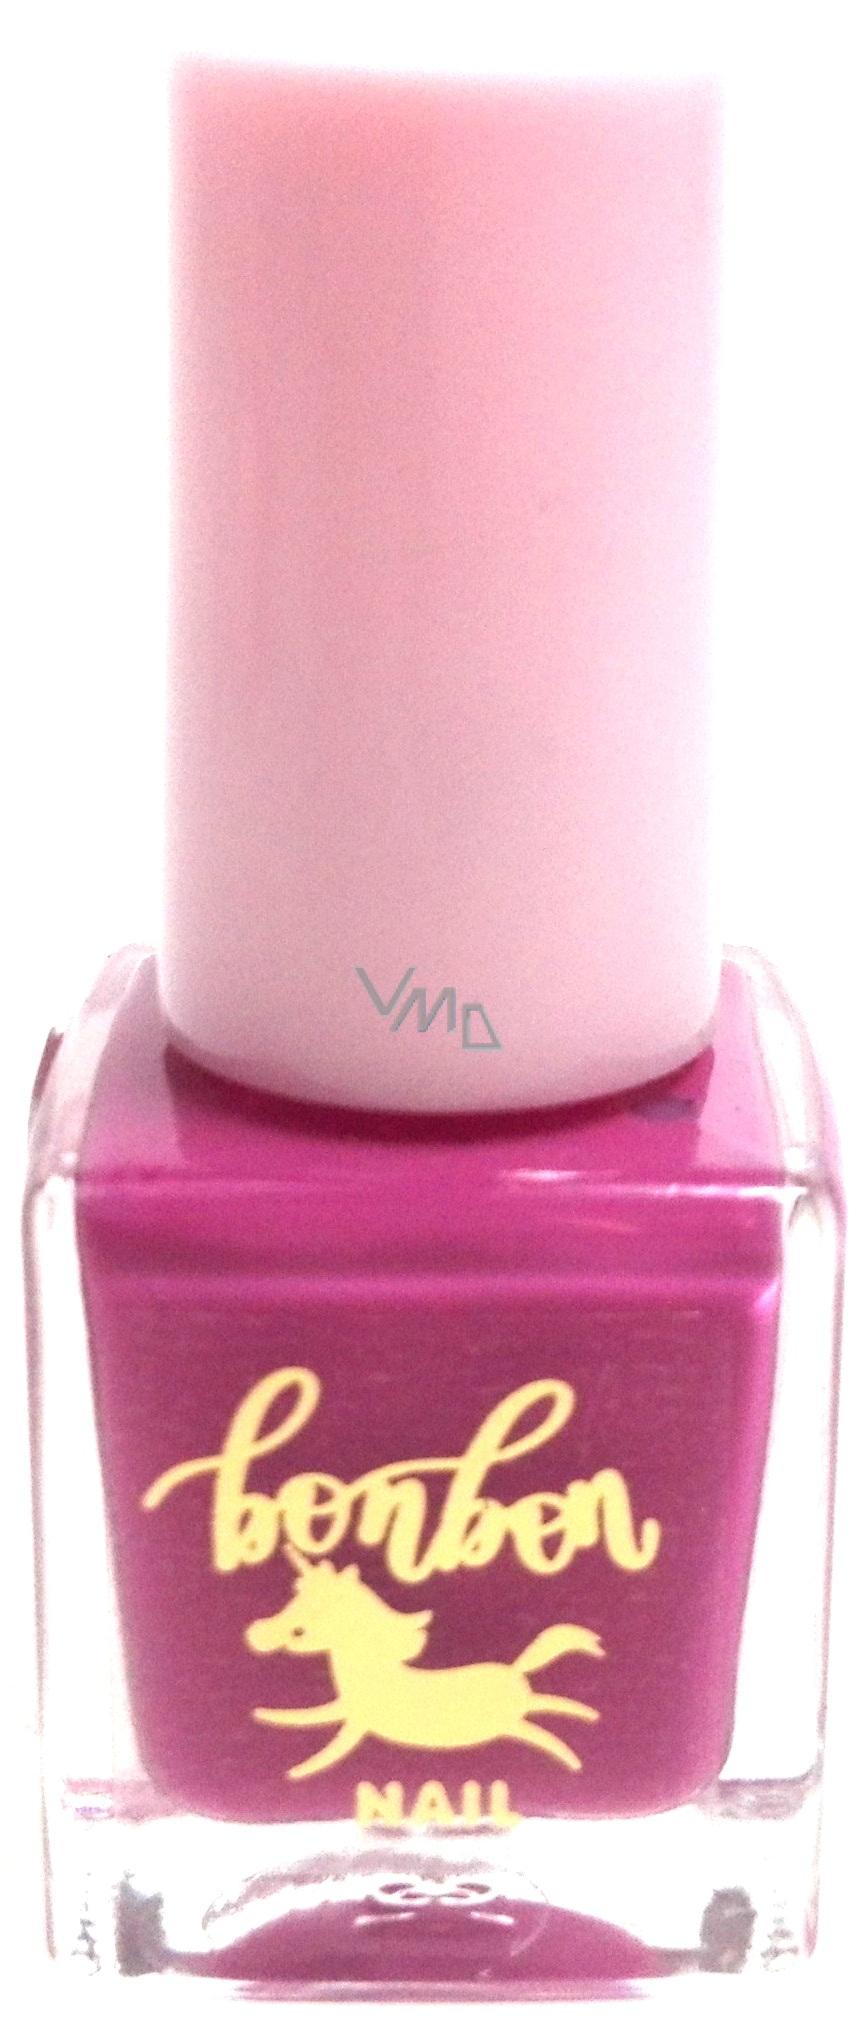 Dor Cosmetics Water Based Nail Polish Bonbon 02 Purple 5 Ml Vmd Parfumerie Drogerie